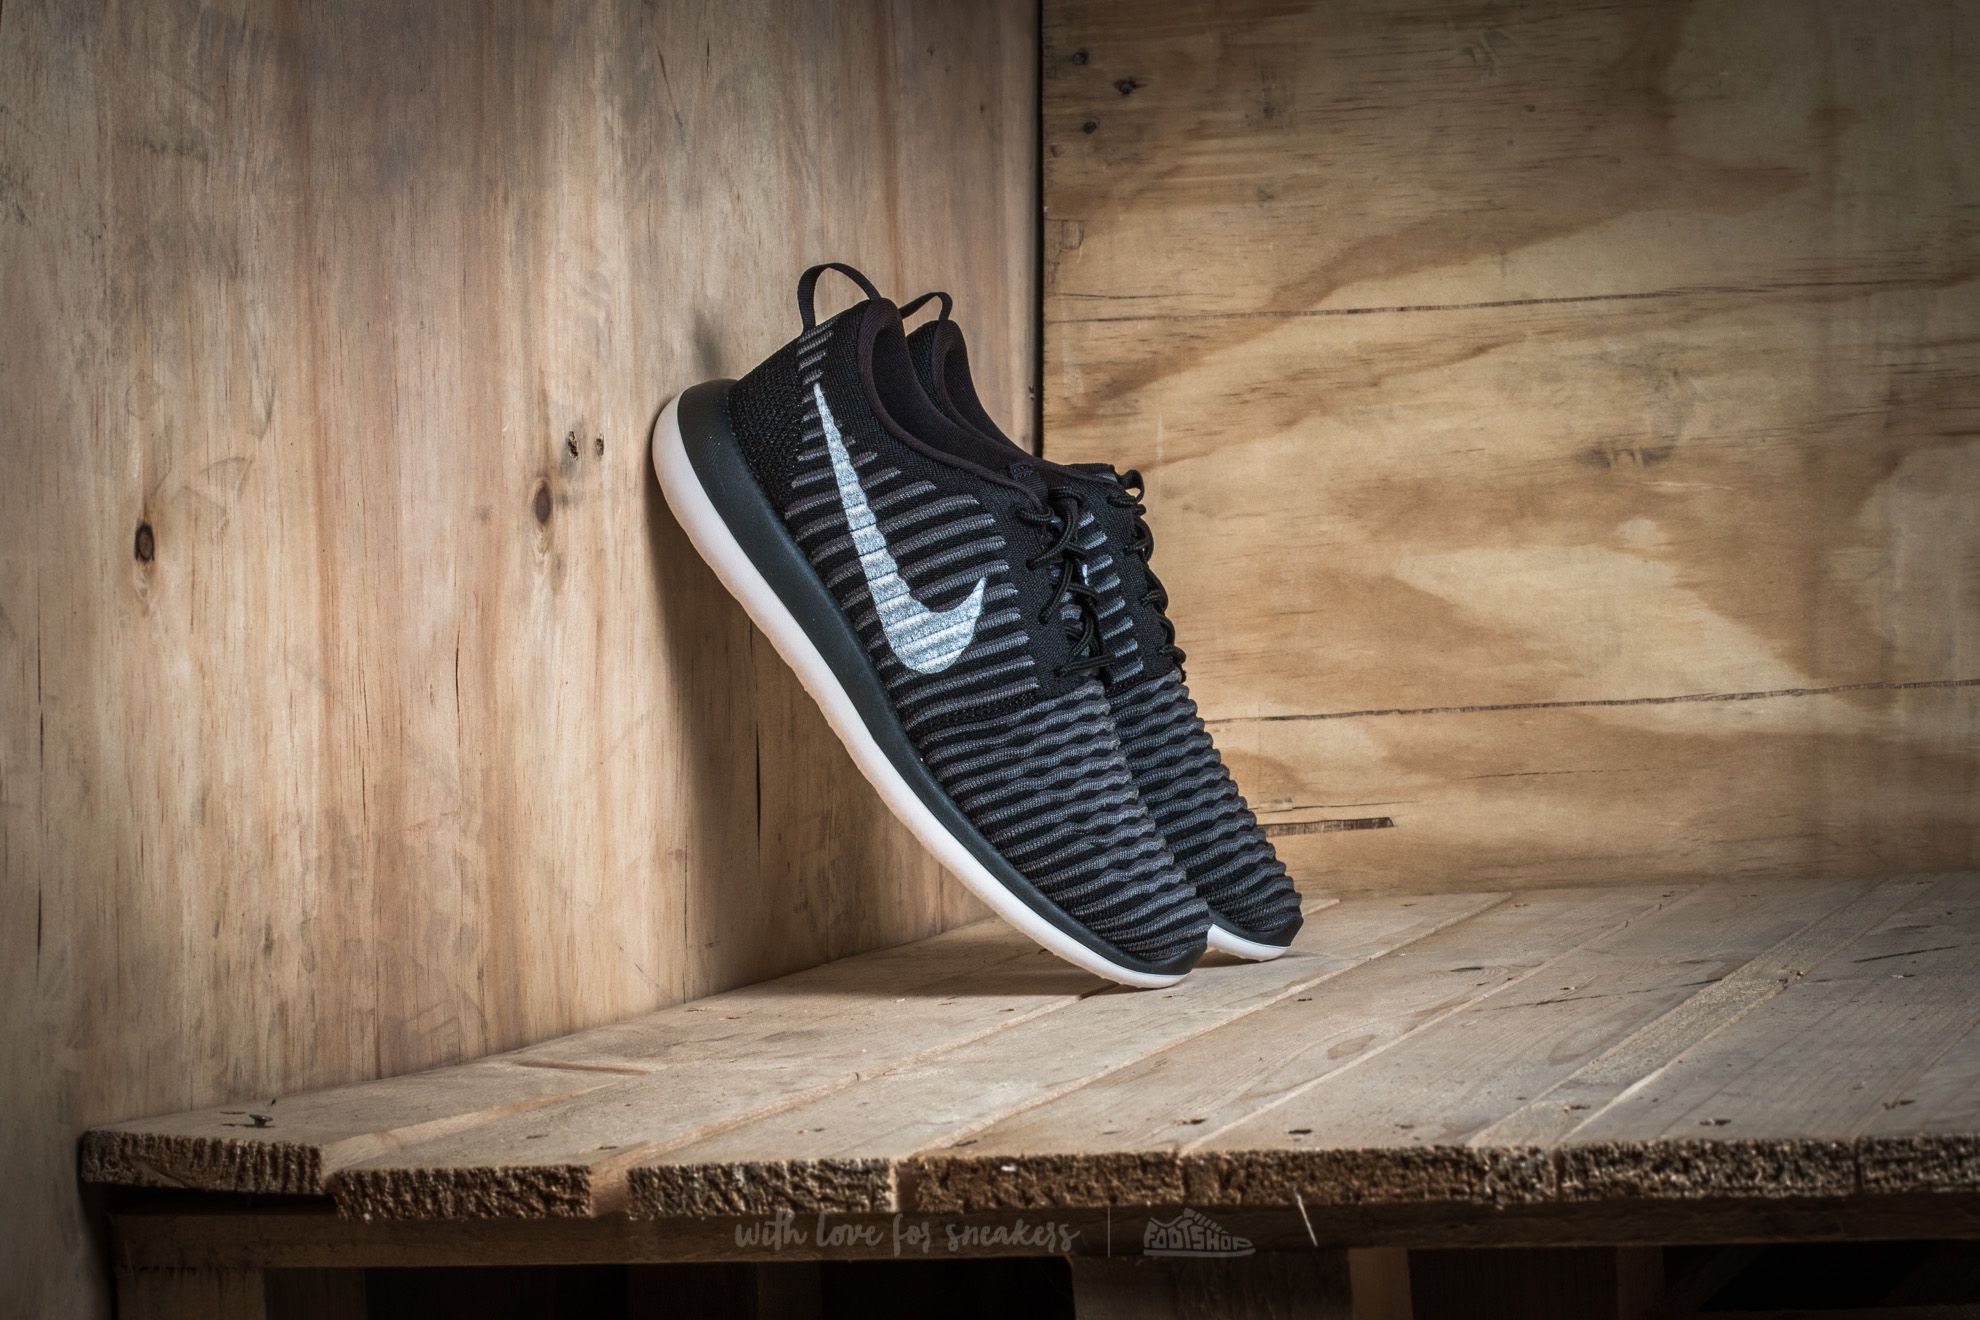 best sneakers 93077 830e7 Nike Roshe Two Flyknit (GS). Black White-Anthracite-Dark Grey